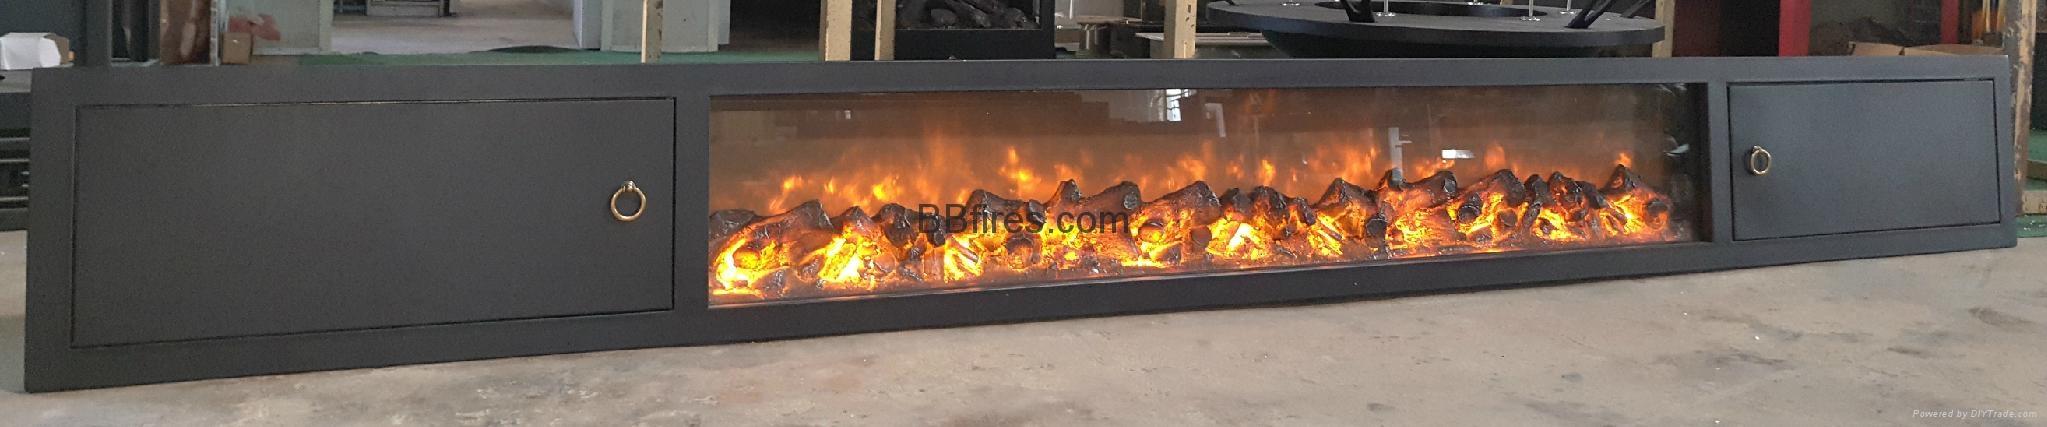 New televison cabinet fireplace set 5